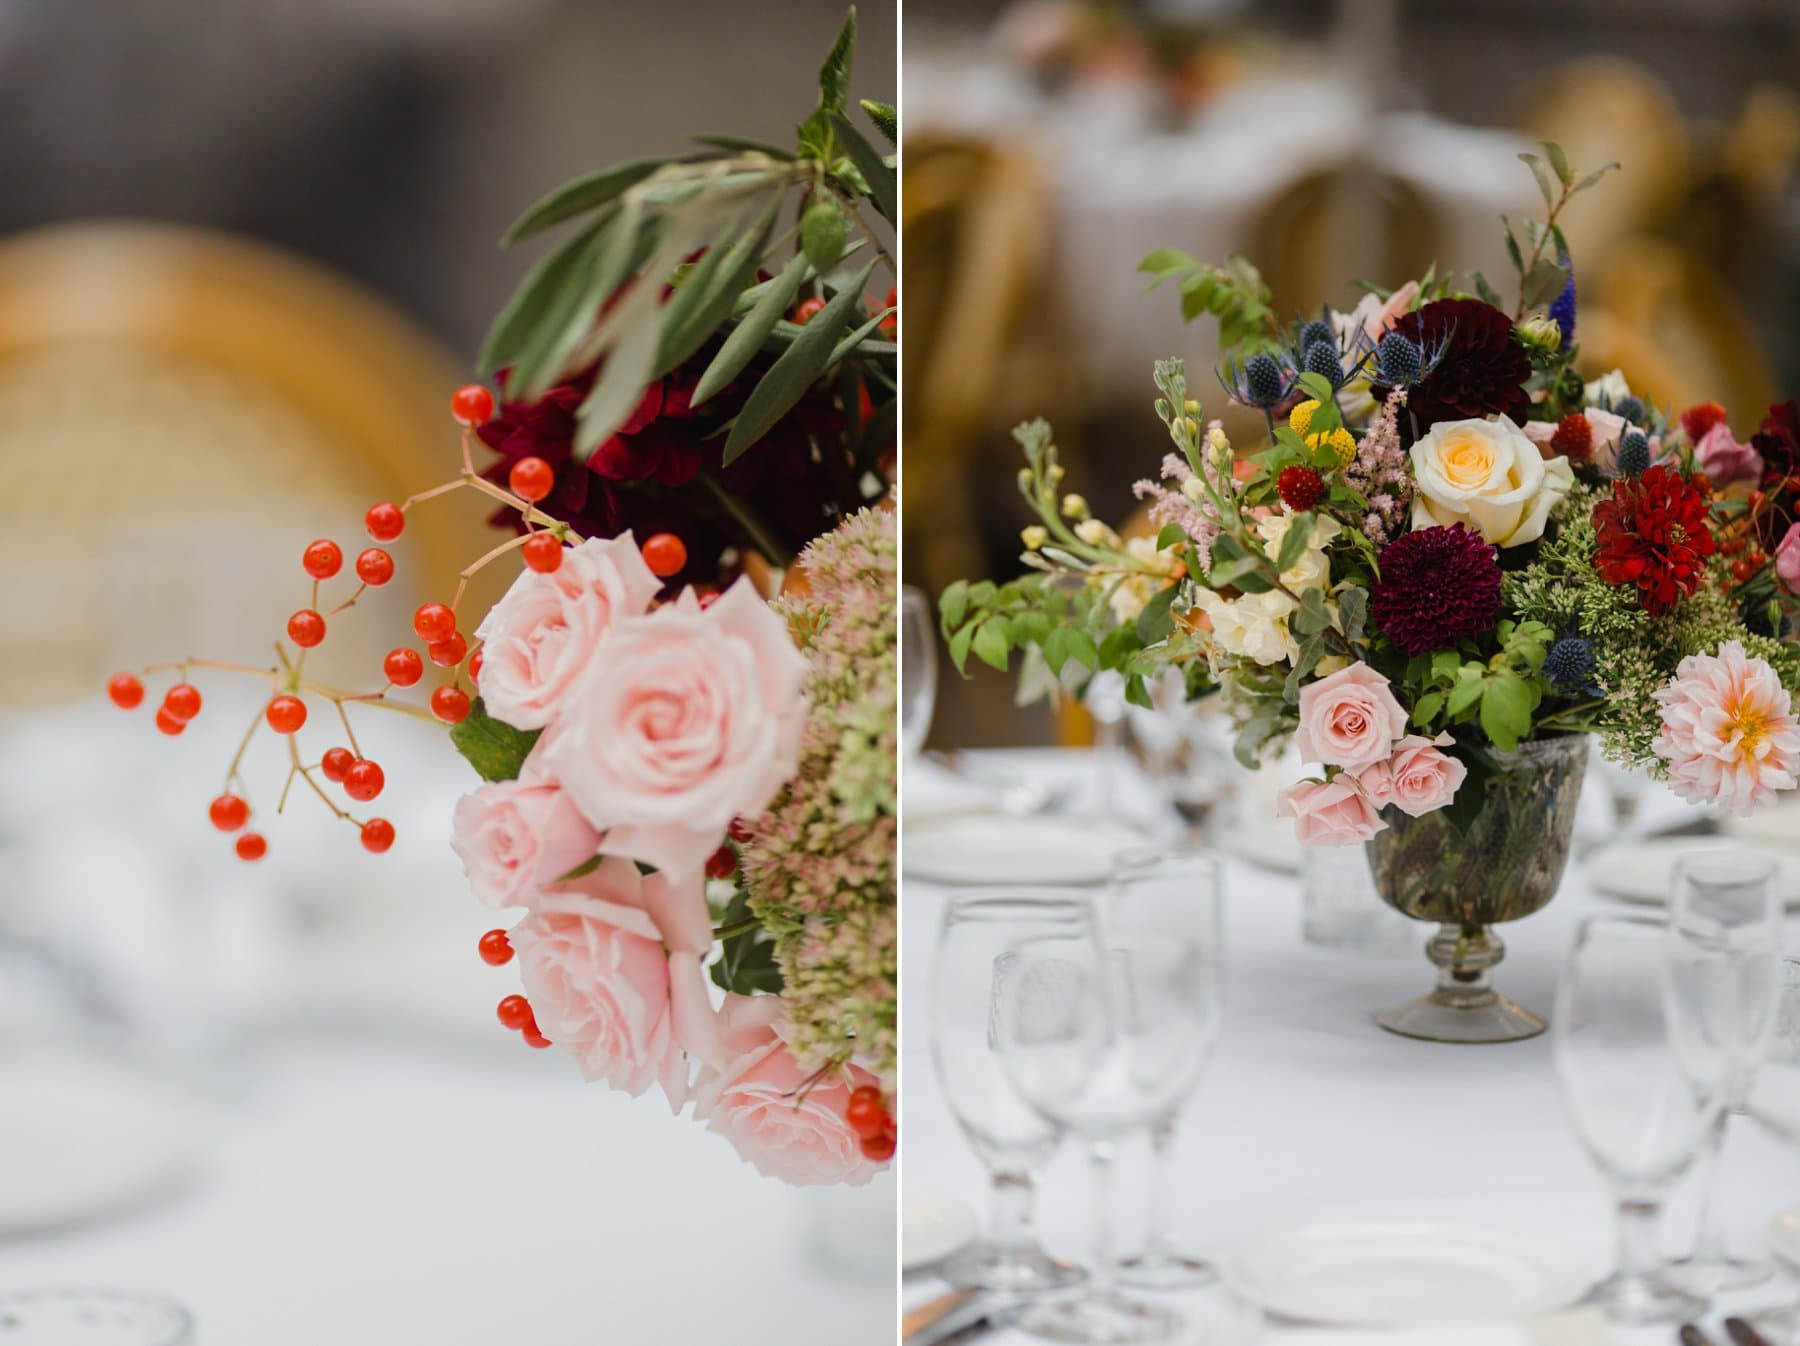 Bryant Park Grill wedding centerpieces garden party